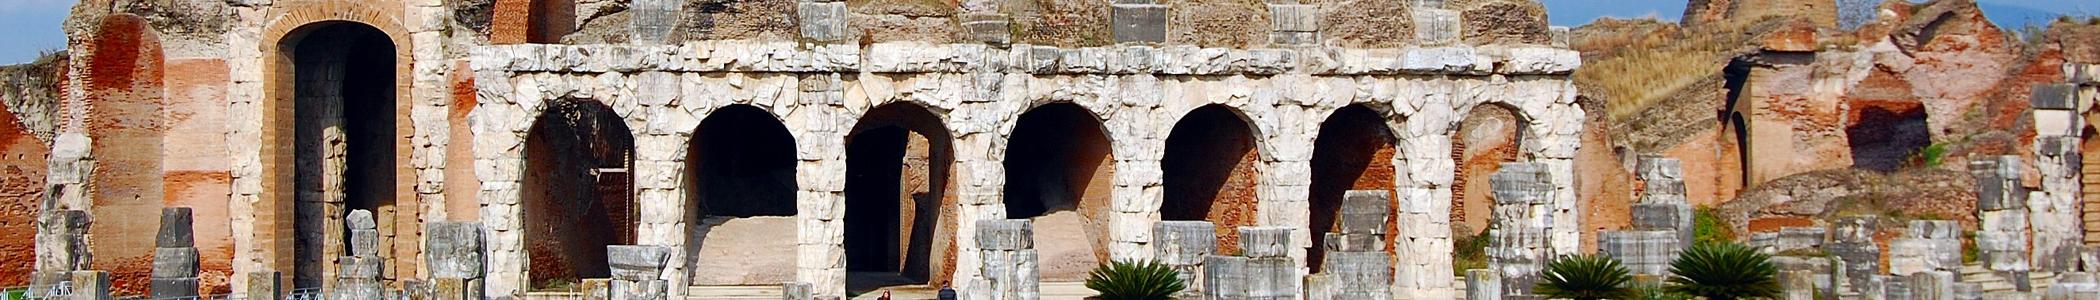 Santa maria capua vetere wikivoyage guida turistica di - Piscina santa maria capua vetere ...